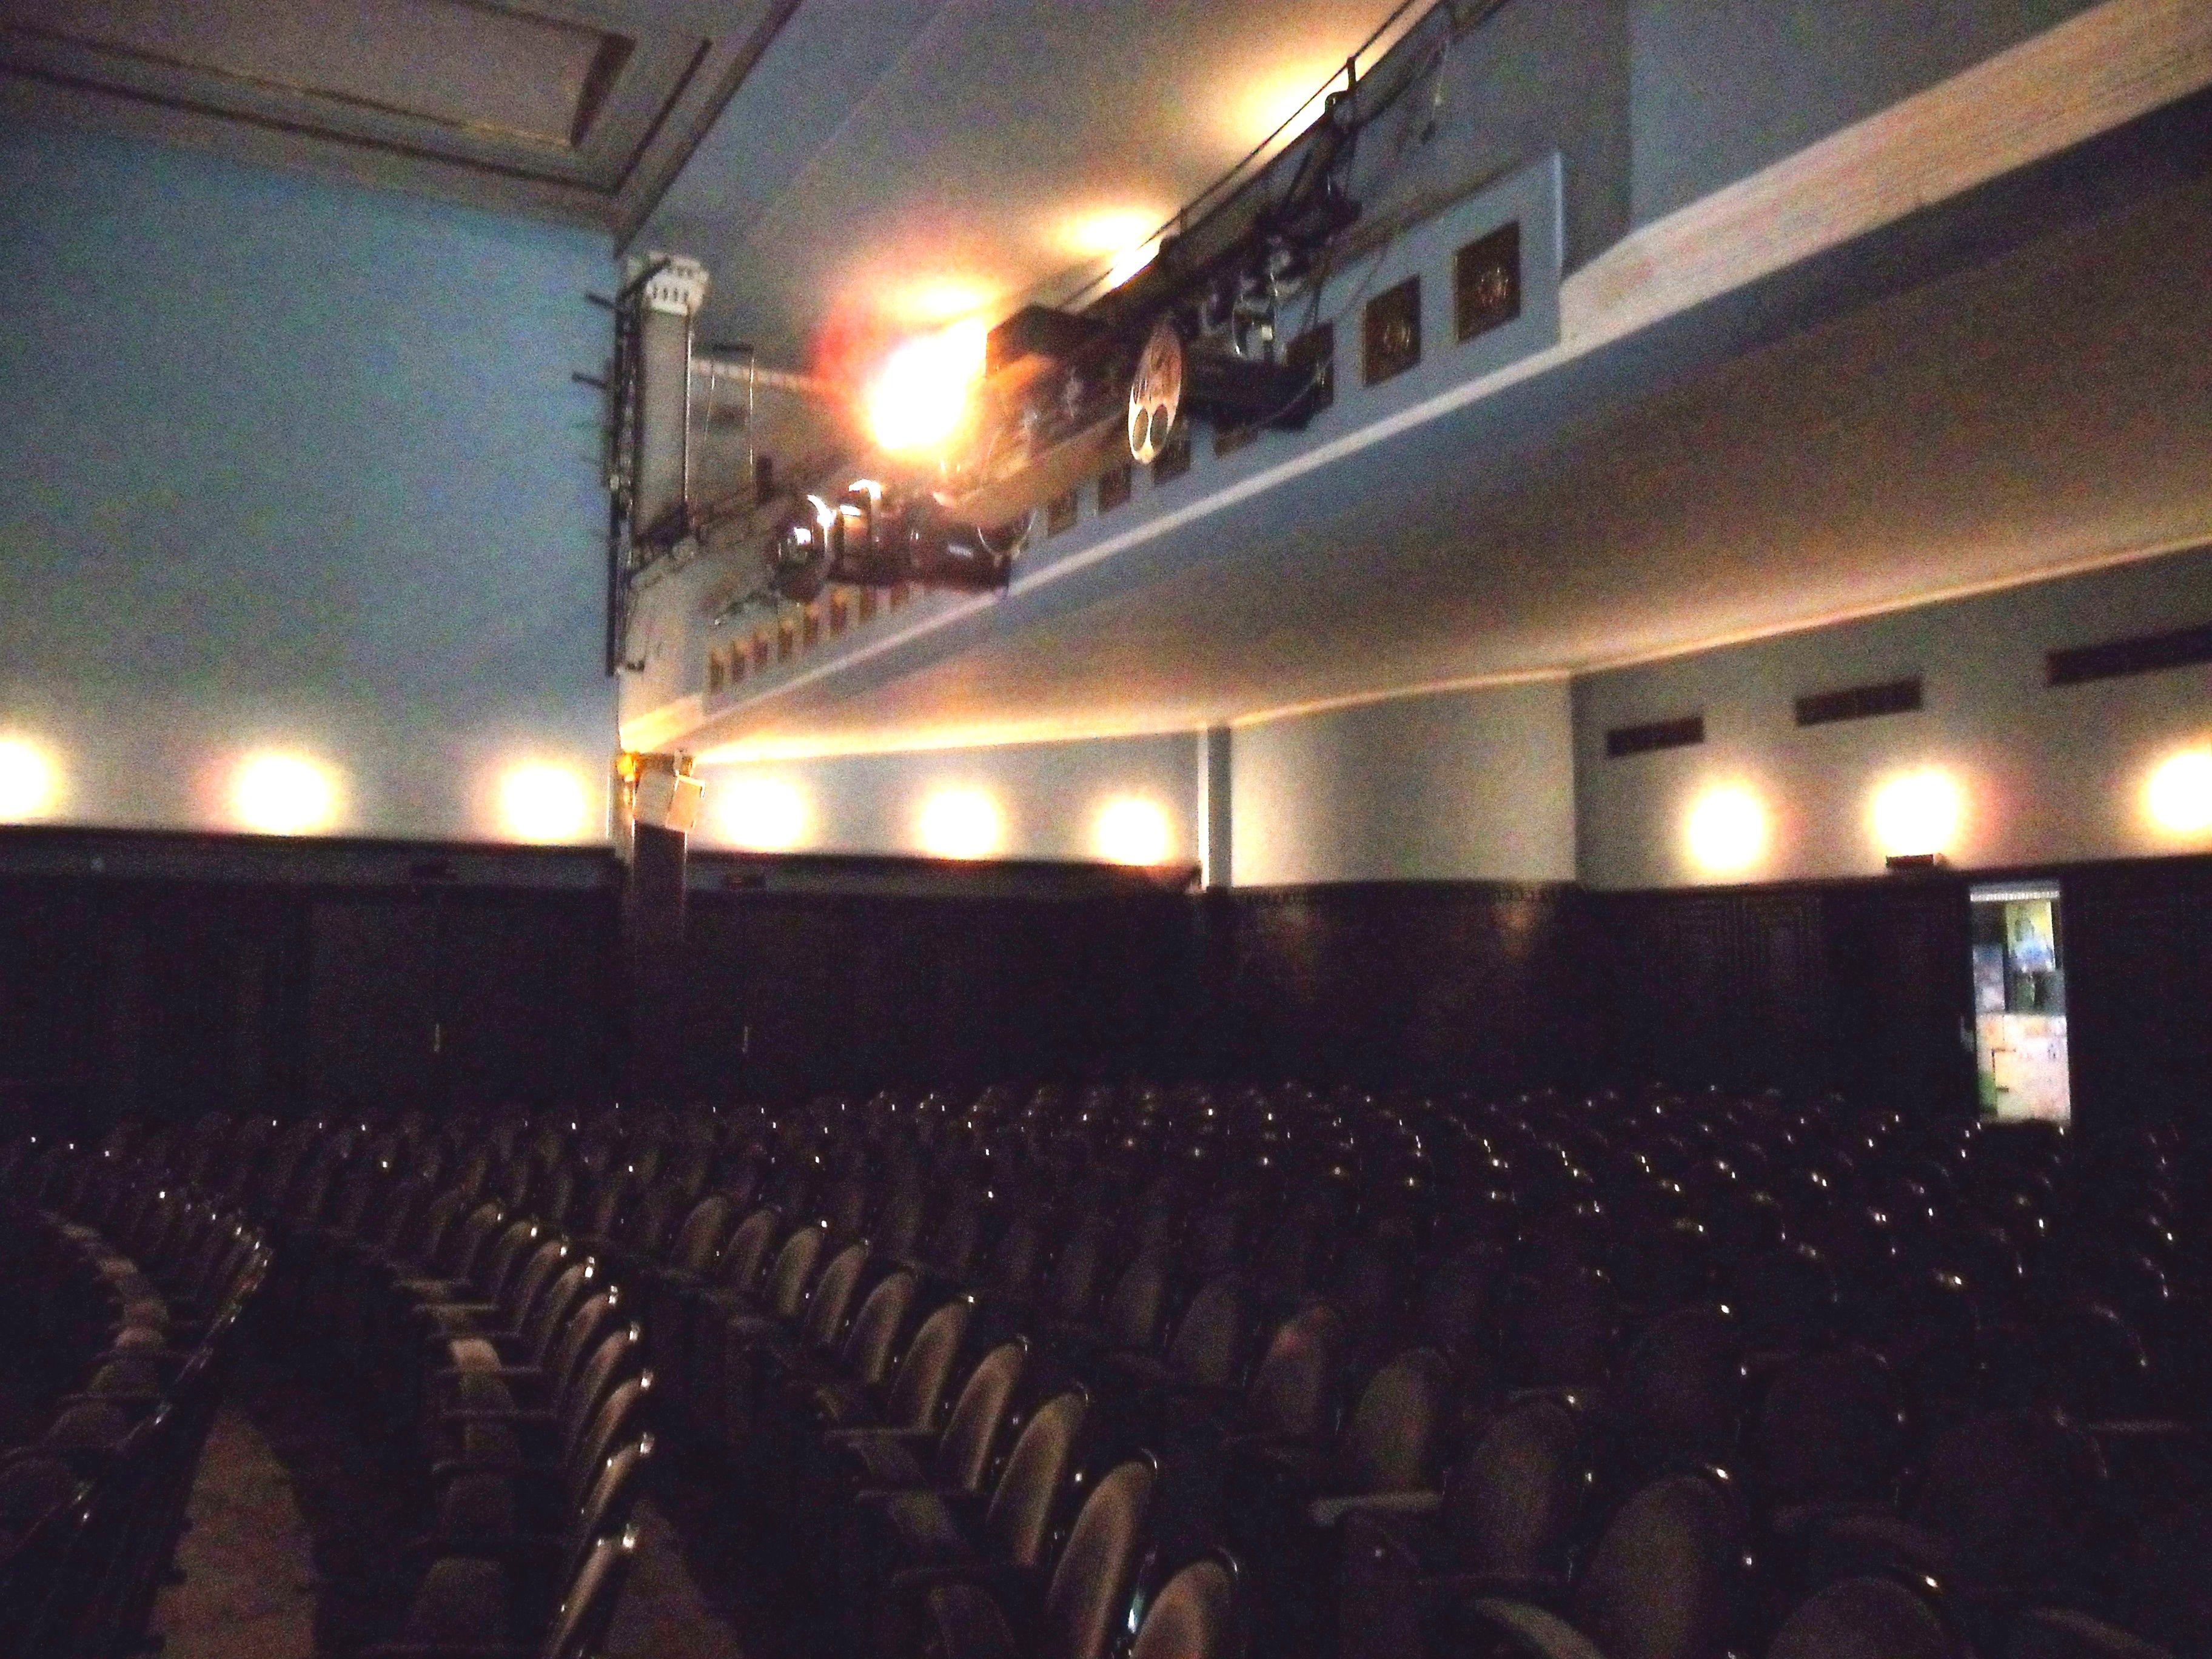 Filemünchner Theater Für Kinder Jpg Wikimedia Commons